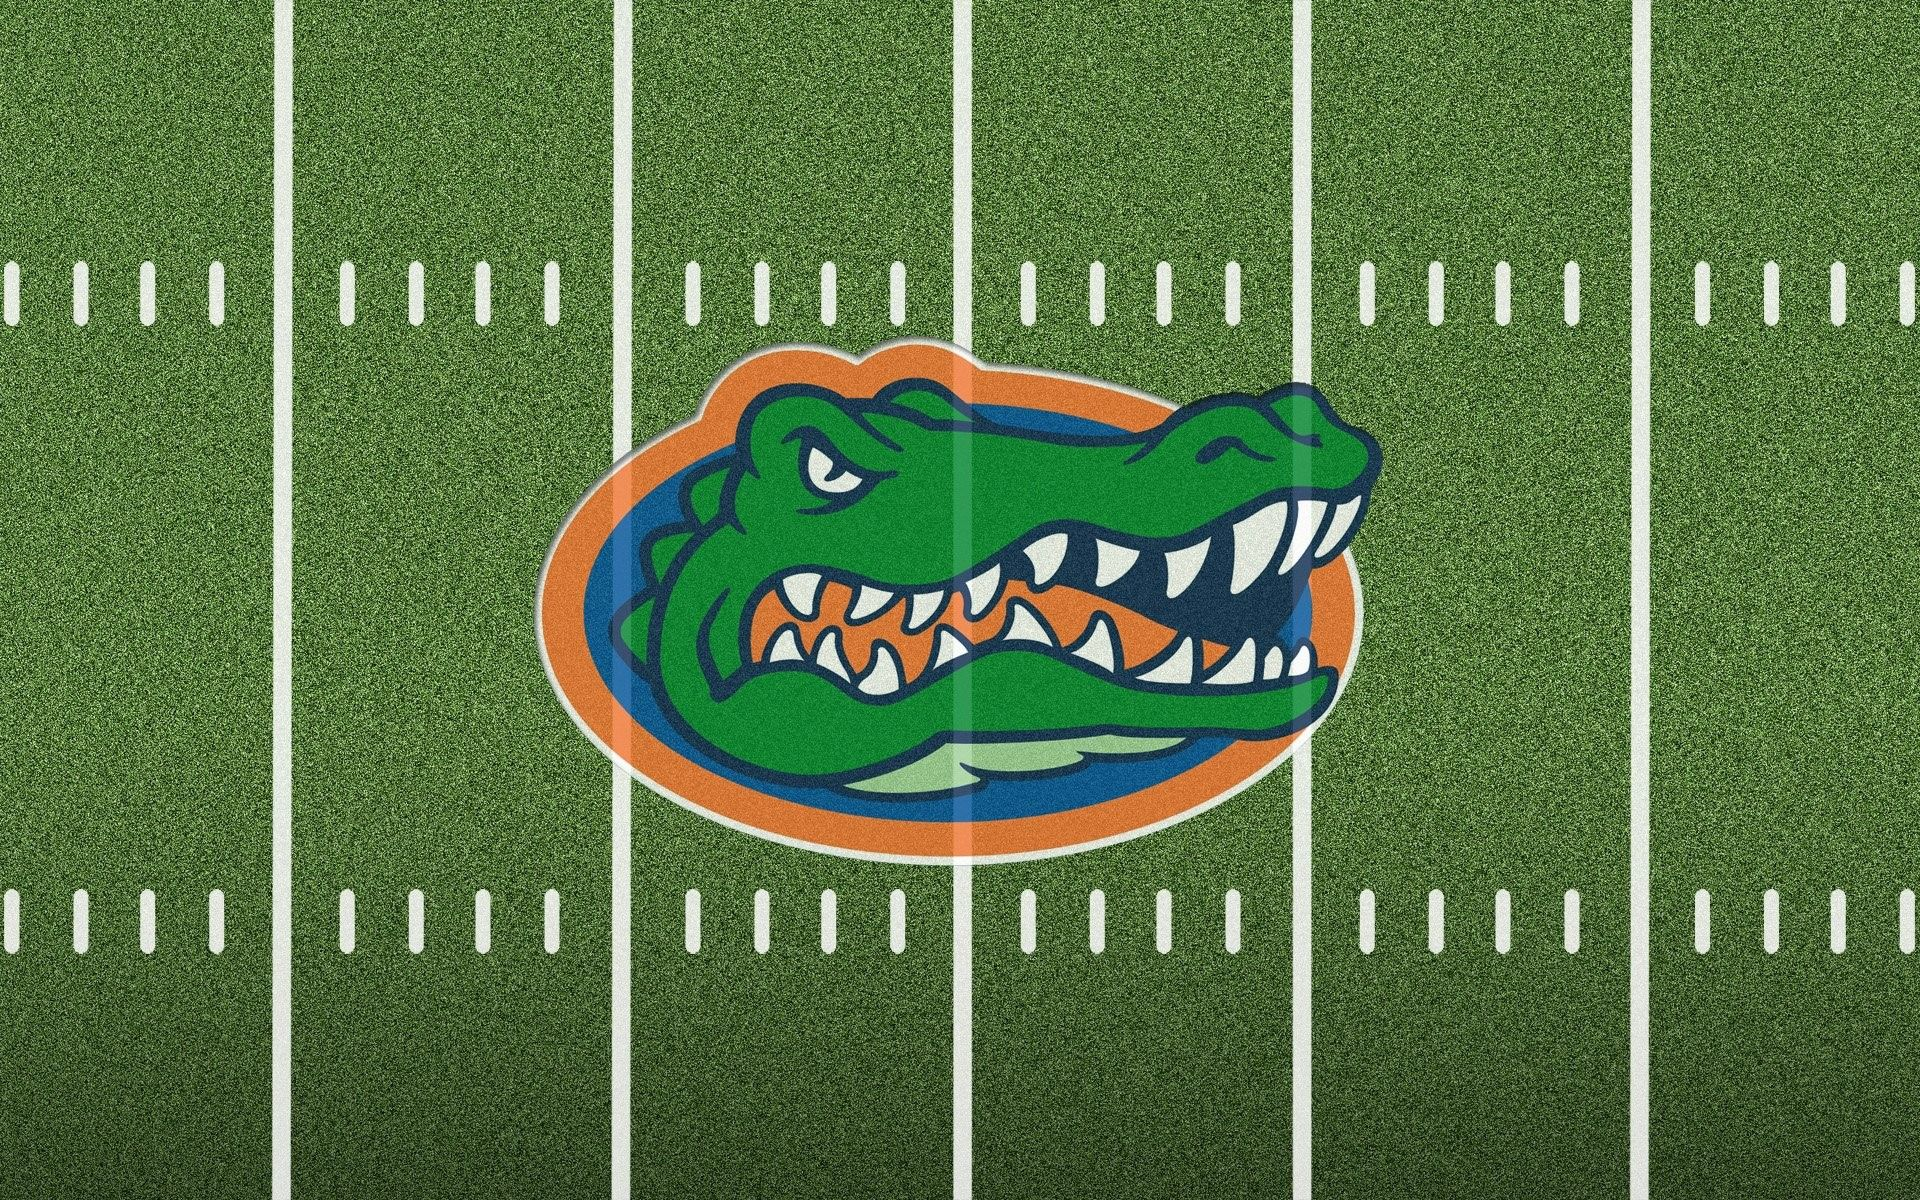 Florida Gator Screensavers And Wallpaper 67 Images In 2020 Florida Gators Football Florida Gators Gators Football